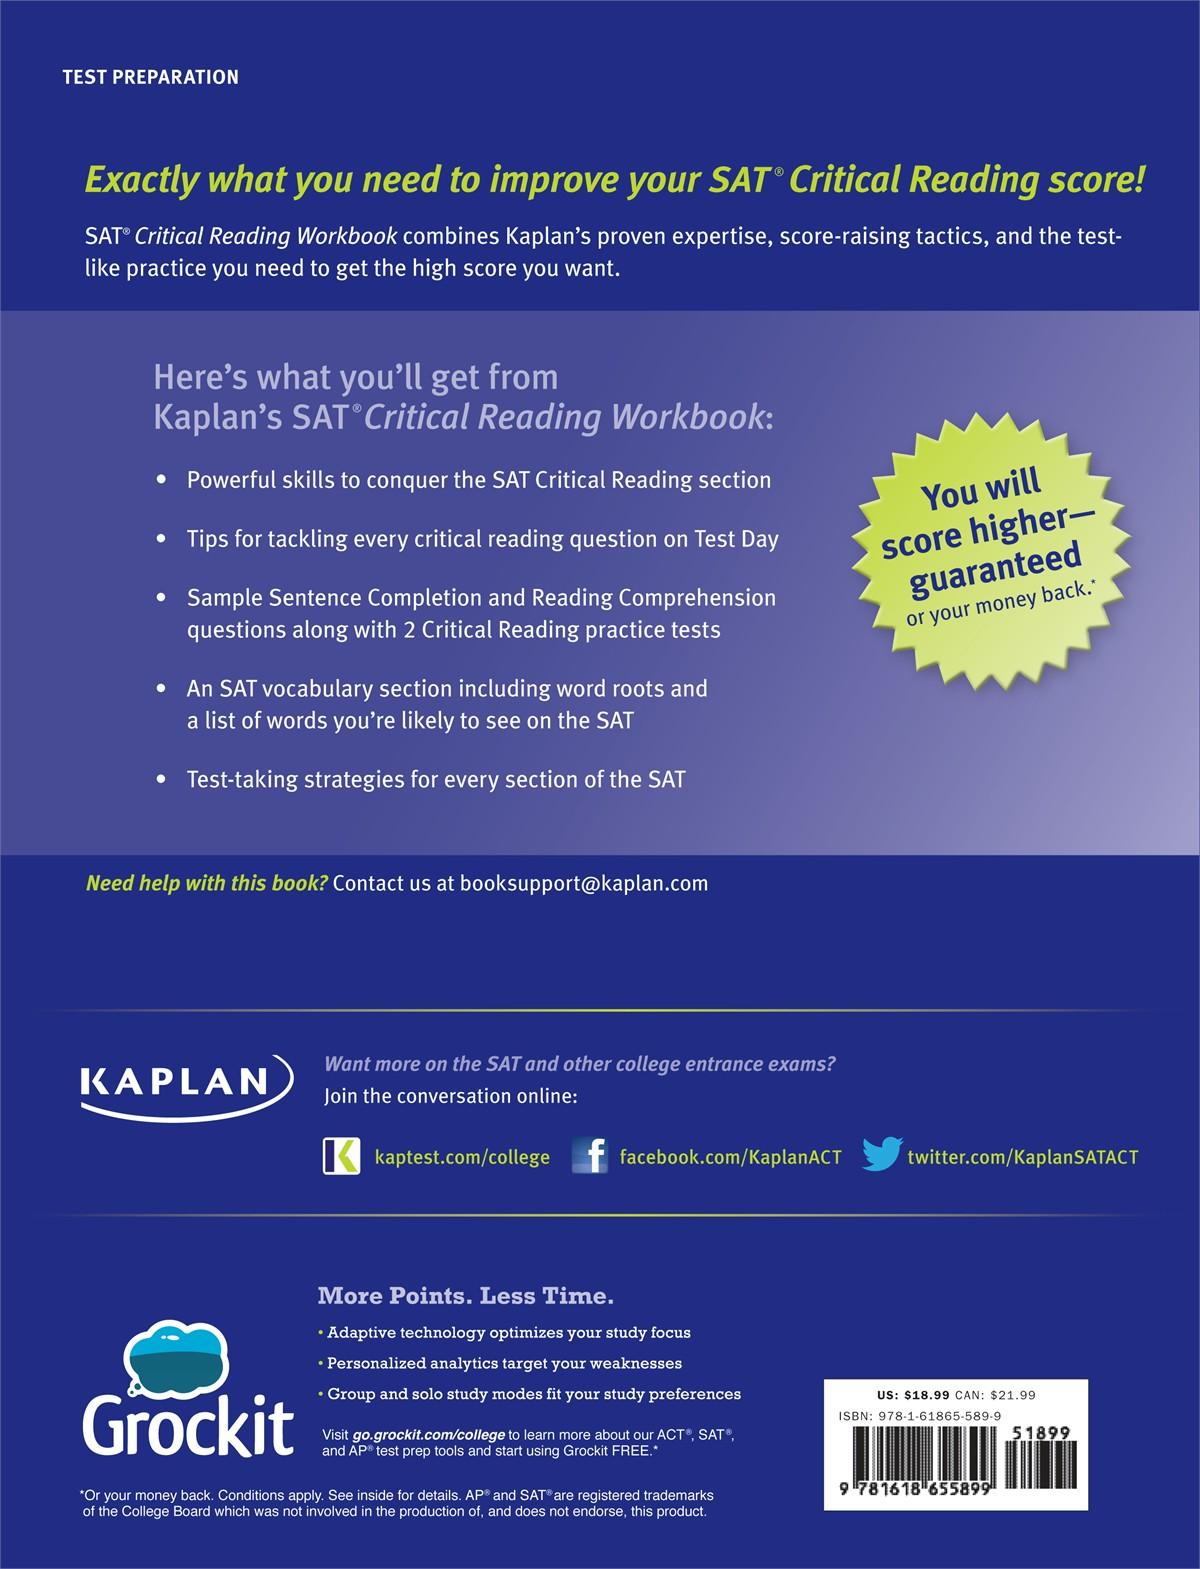 Workbooks kaplan sat critical reading workbook : Kaplan SAT Critical Reading Workbook - PDF books with free ebook ...